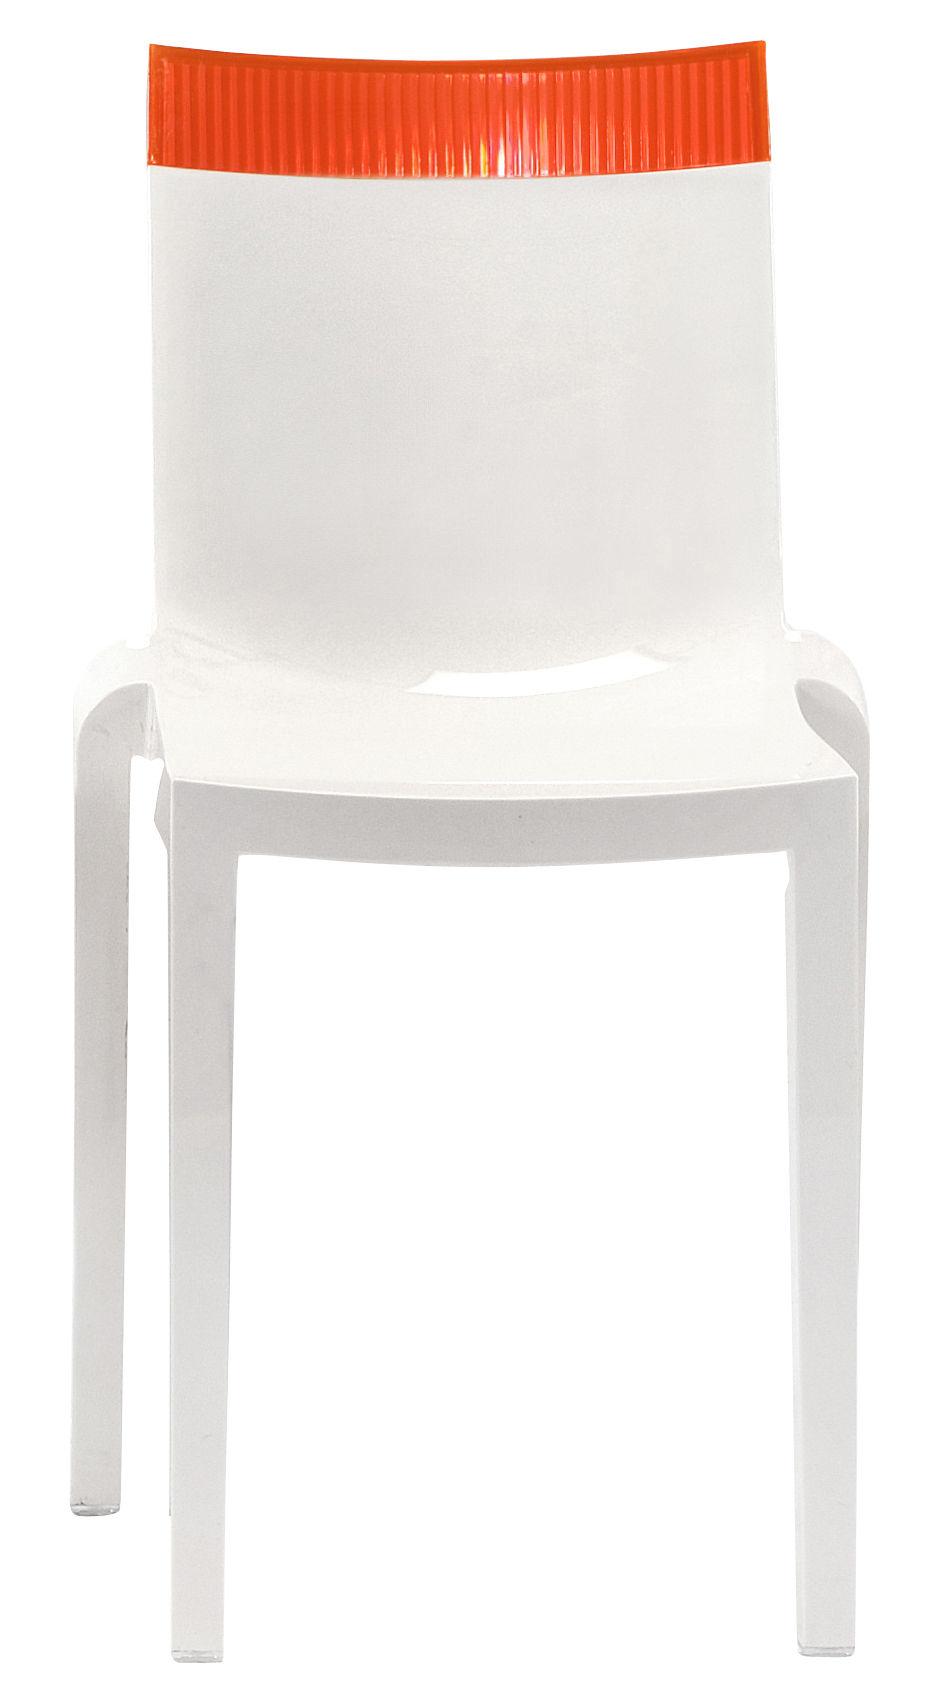 Chaise empilable hi cut blanche polycarbonate blanc laqu orange kartell - Chaise polycarbonate blanche ...